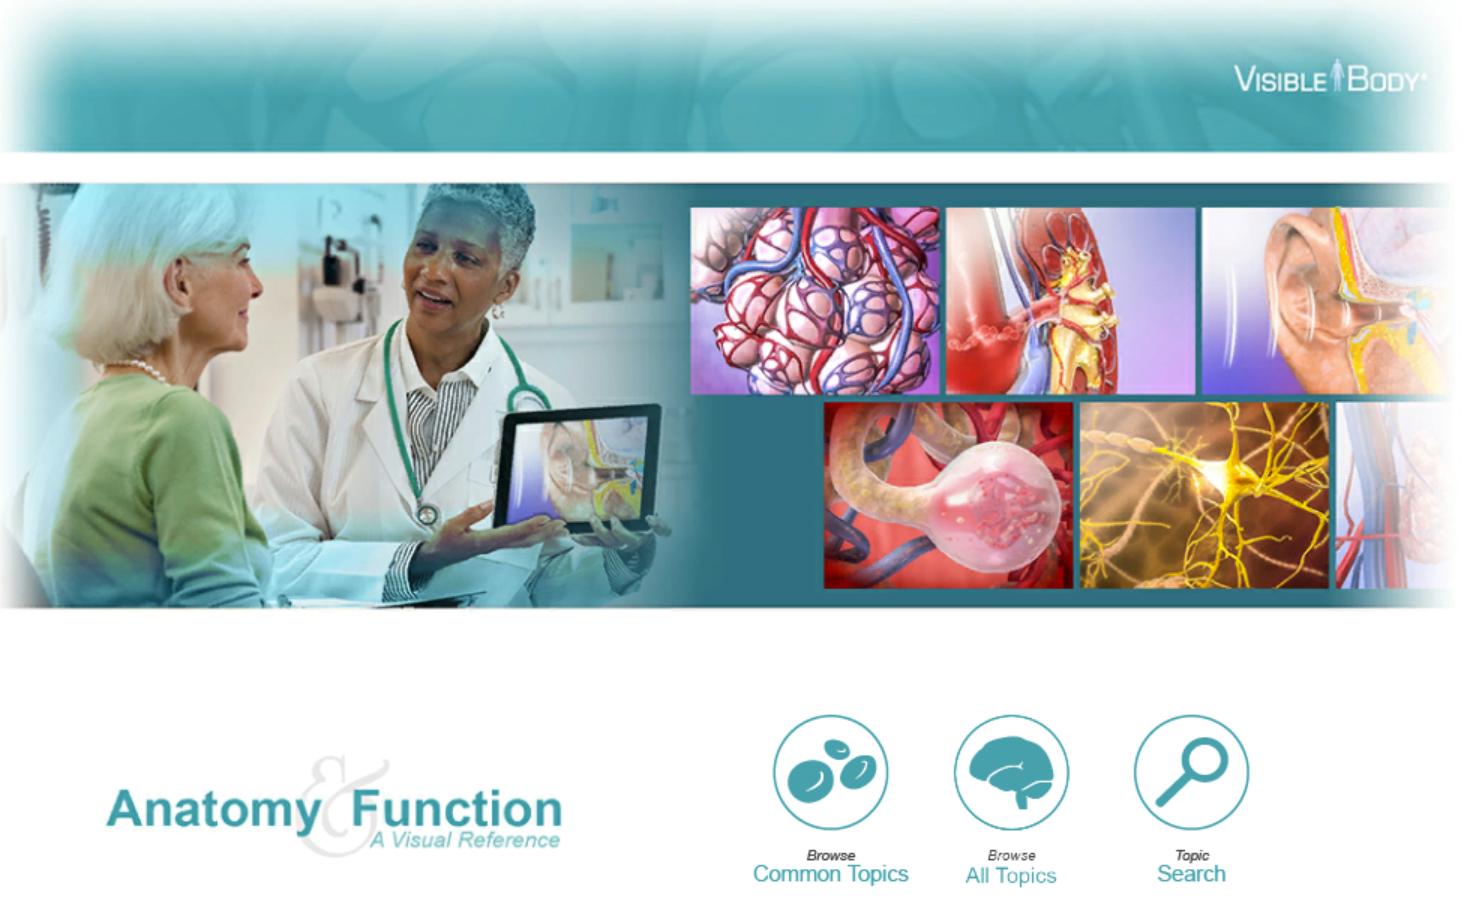 Skjermdump fra Anatomy and function